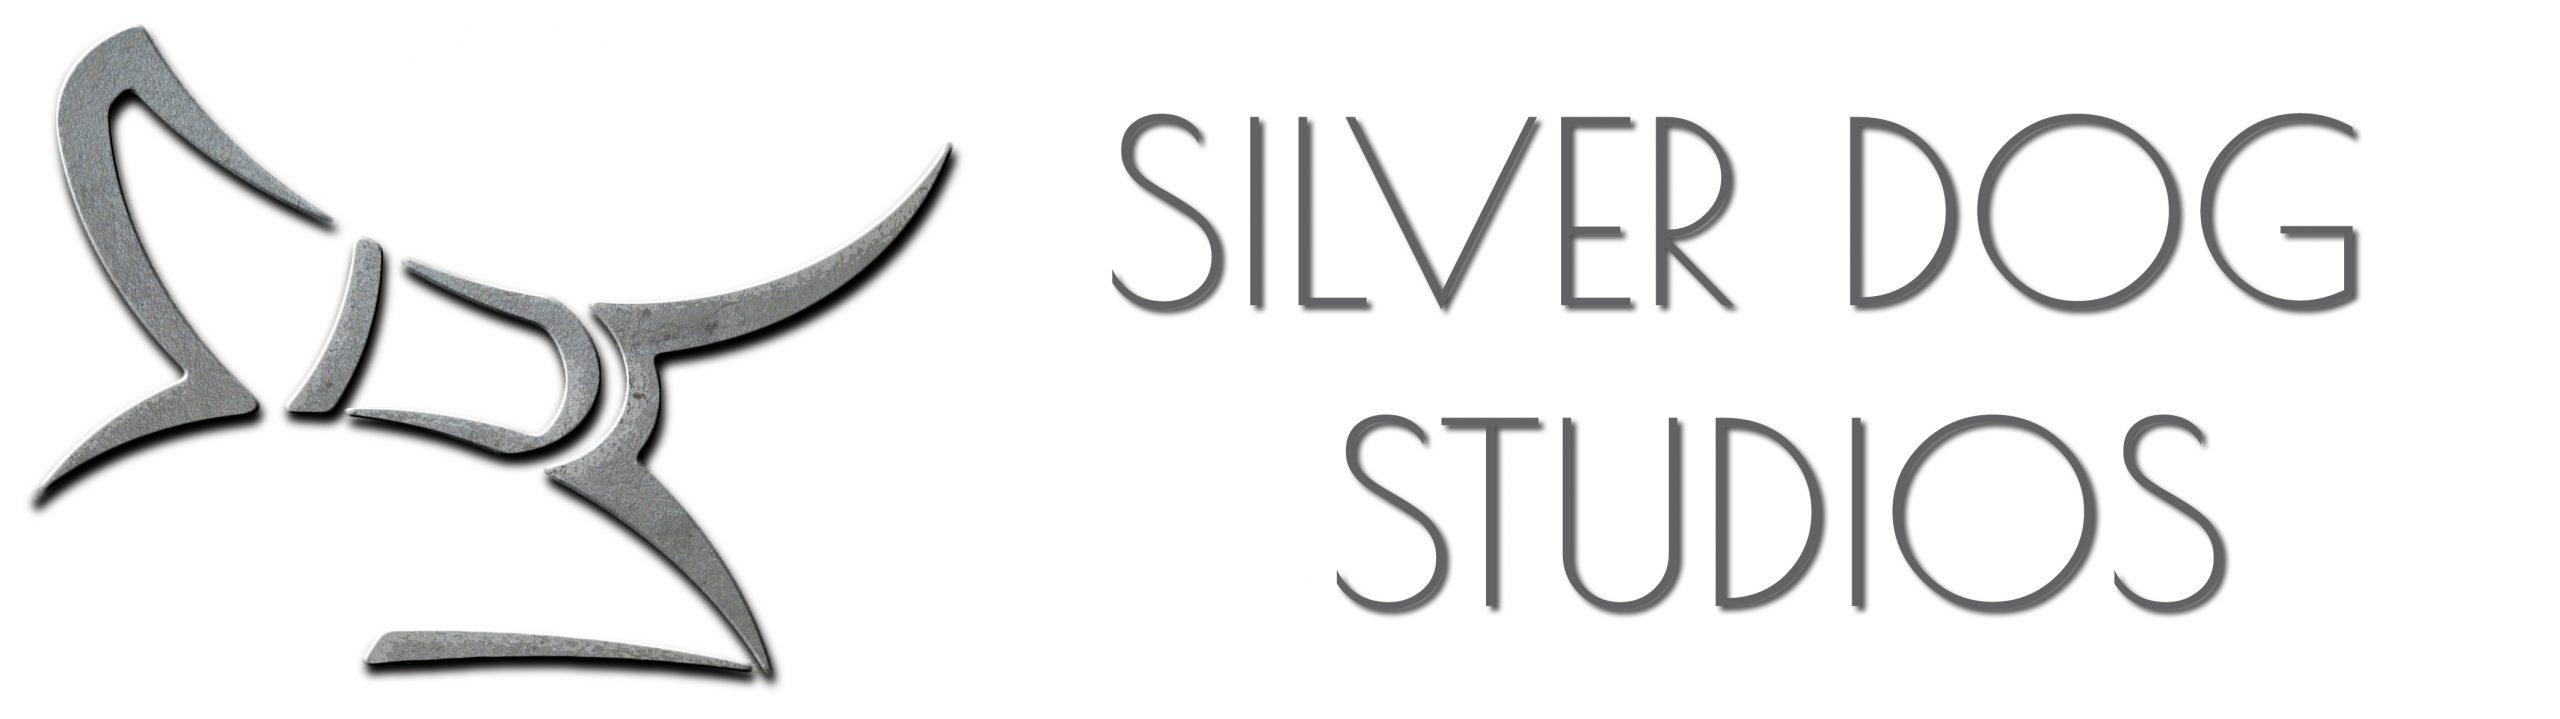 silver dog studios logo and name